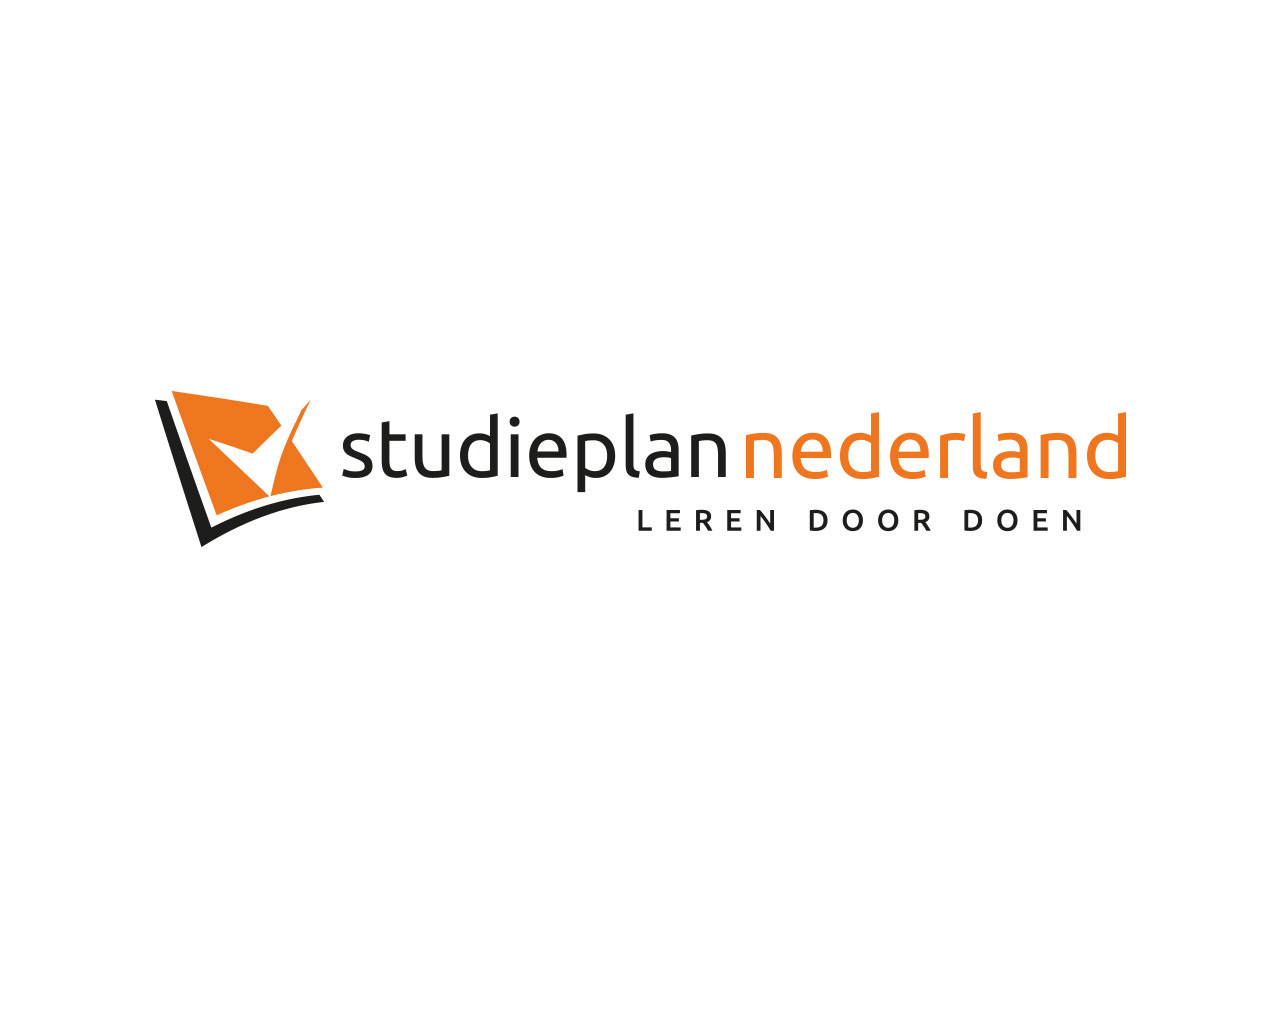 logo studieplan nederland